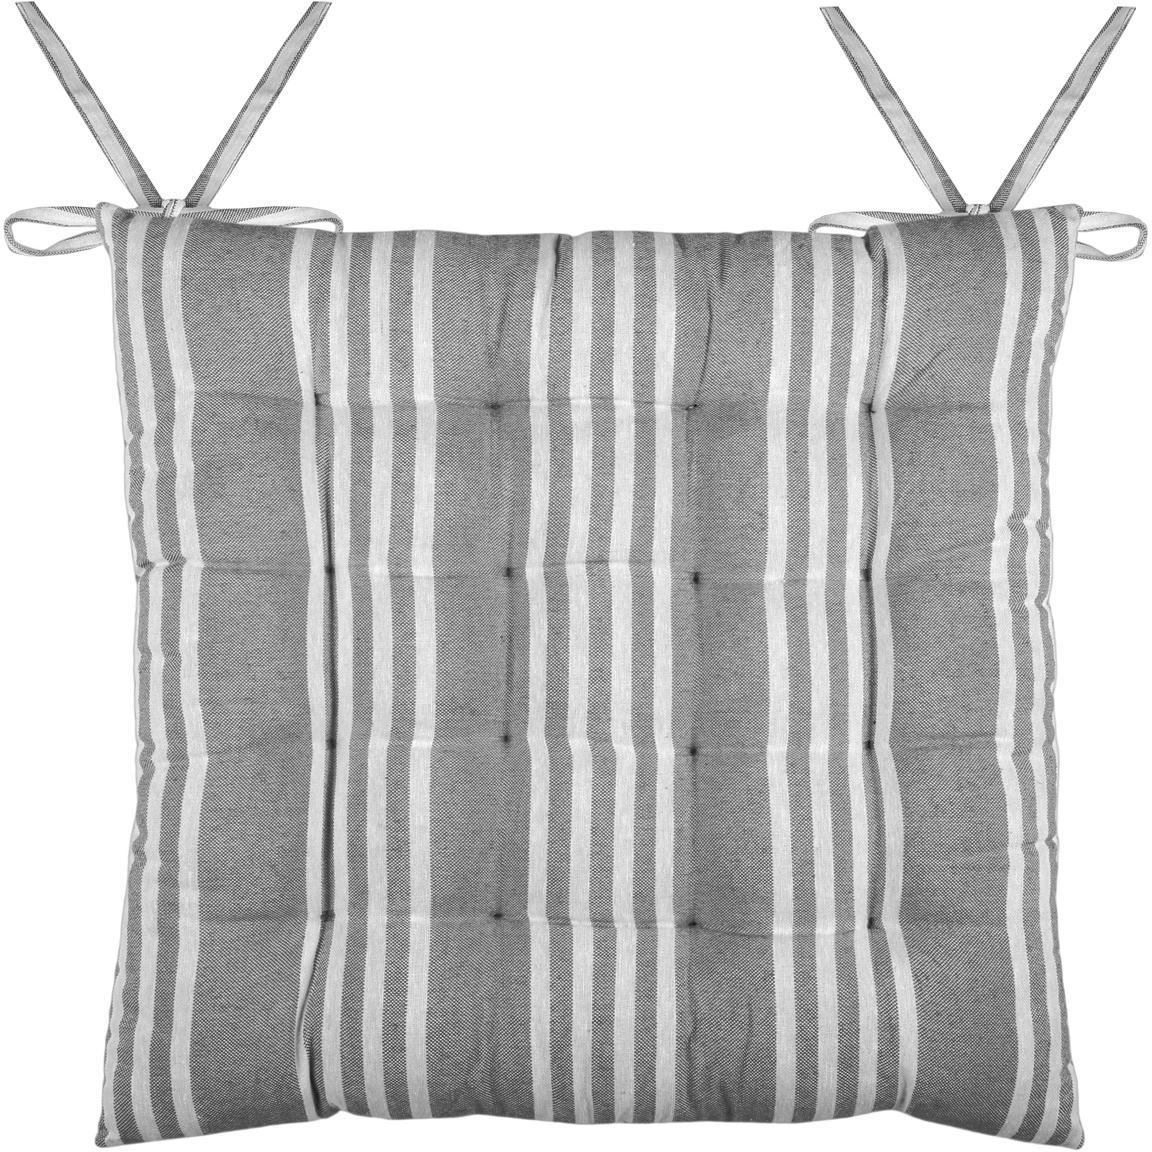 Stoelkussen Mandelieu, Katoenmix, Donkergrijs, wit, 40 x 40 cm